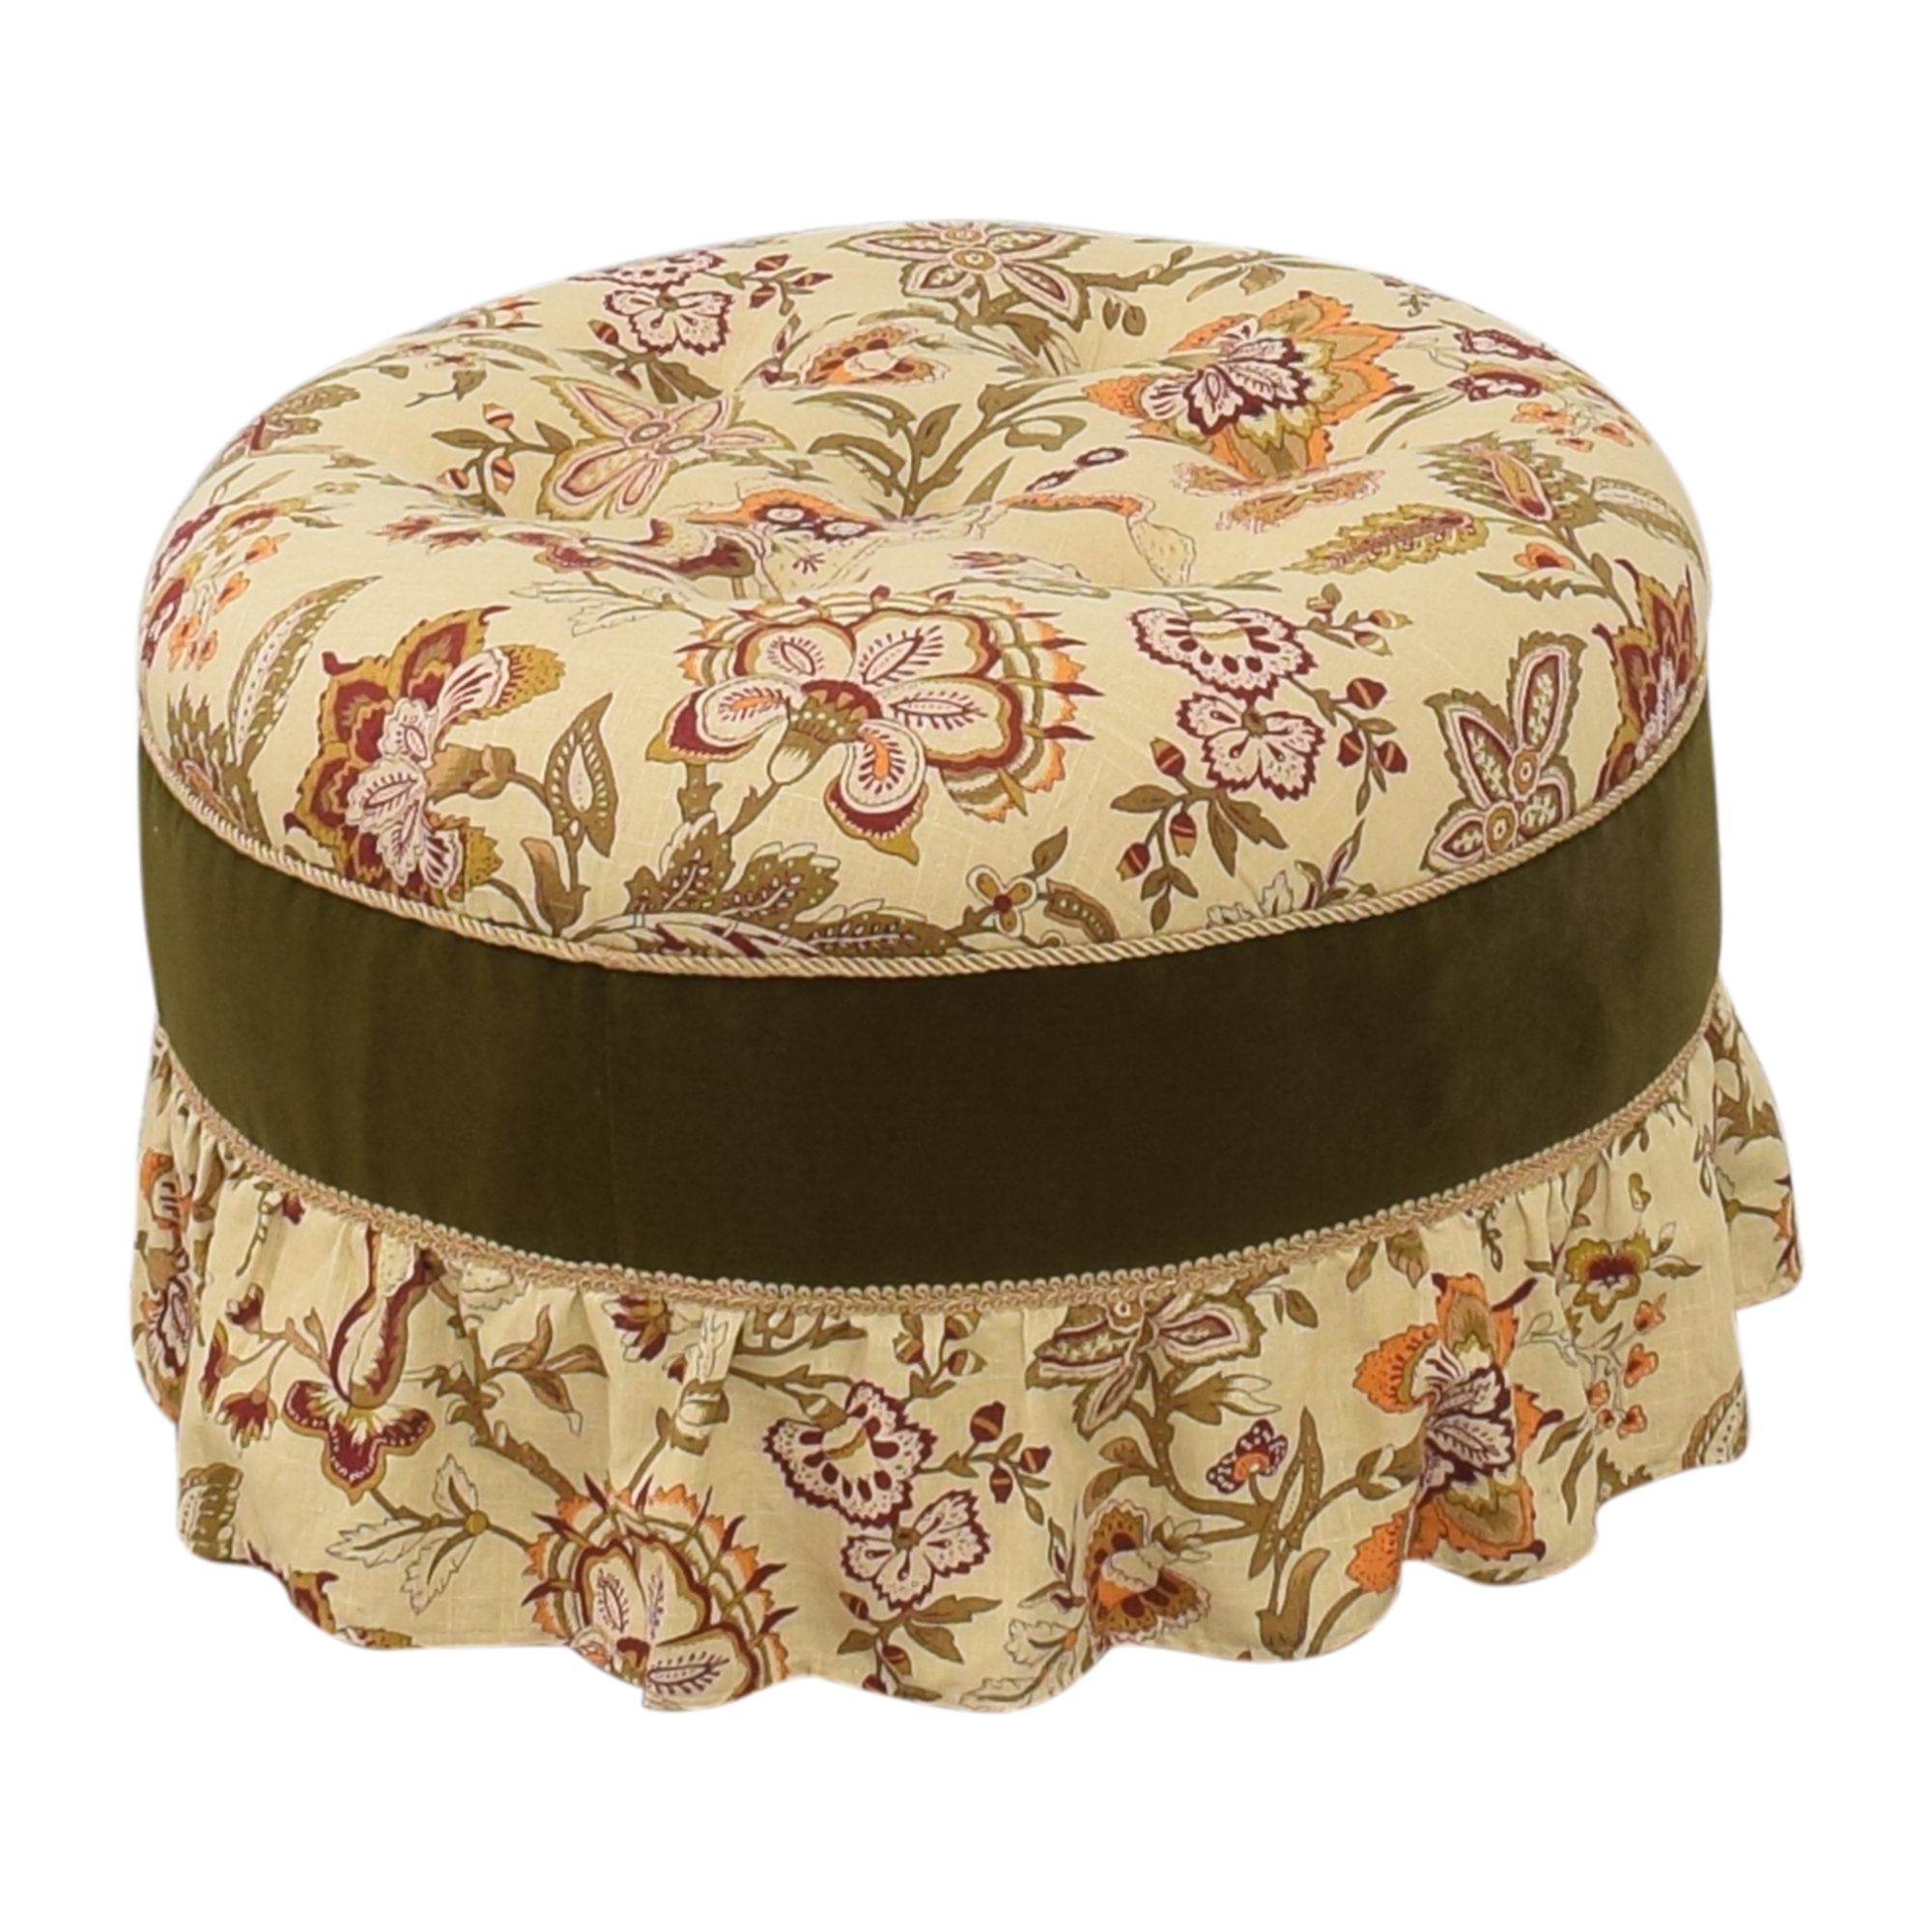 Skirted Round Ottoman multi